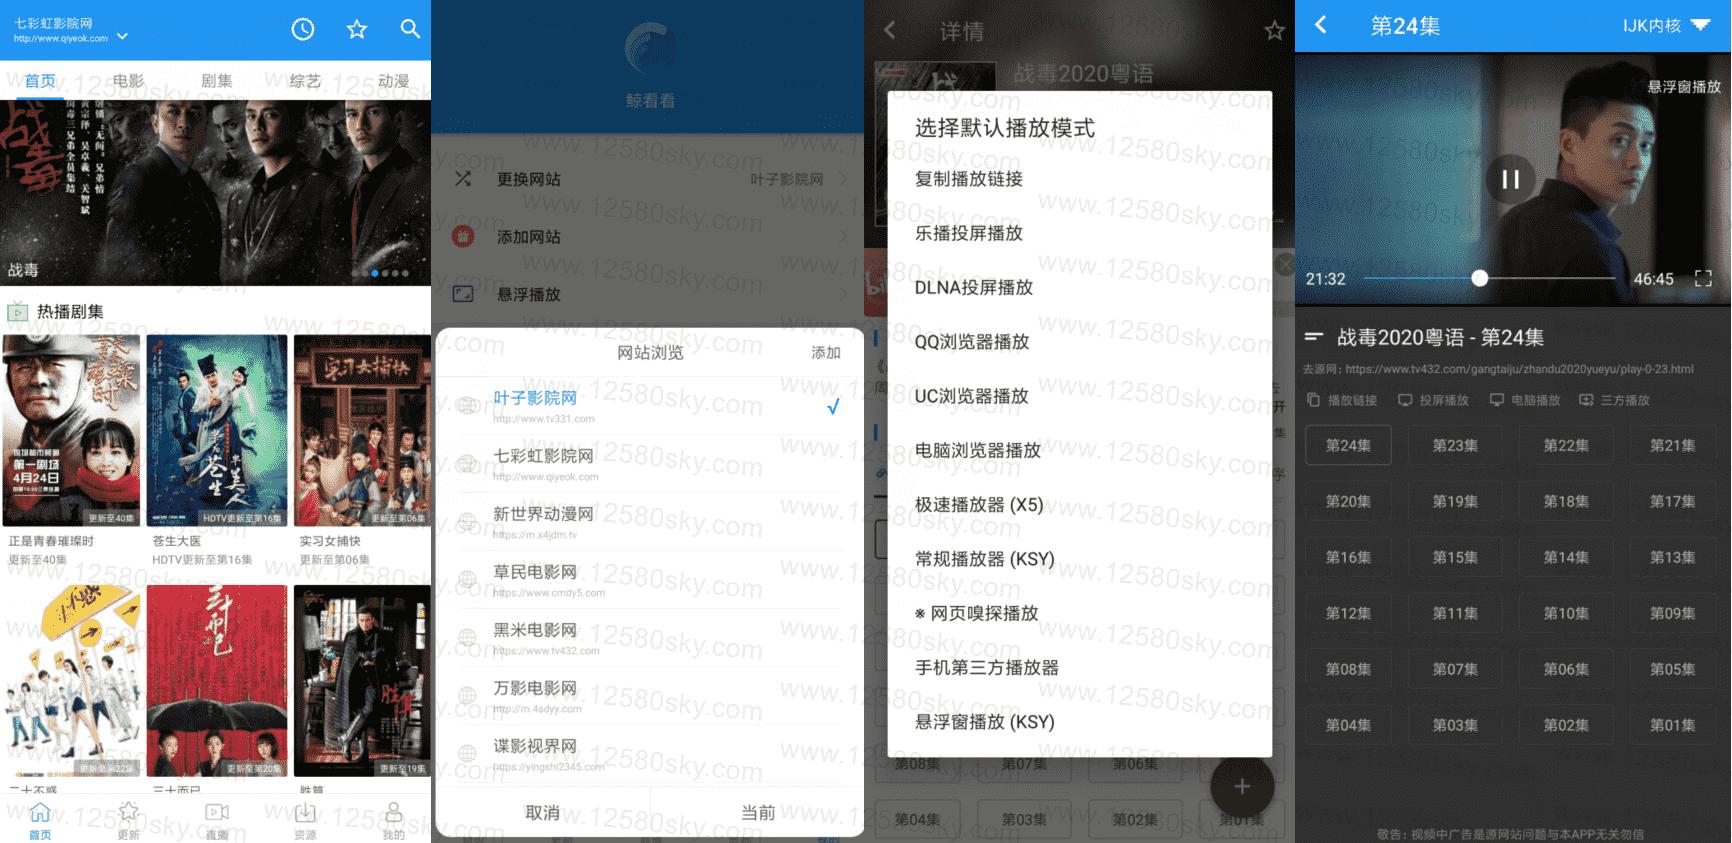 [Android]聚合影视app:鲸看看V1.9.29 VIP电影免费观看 配图